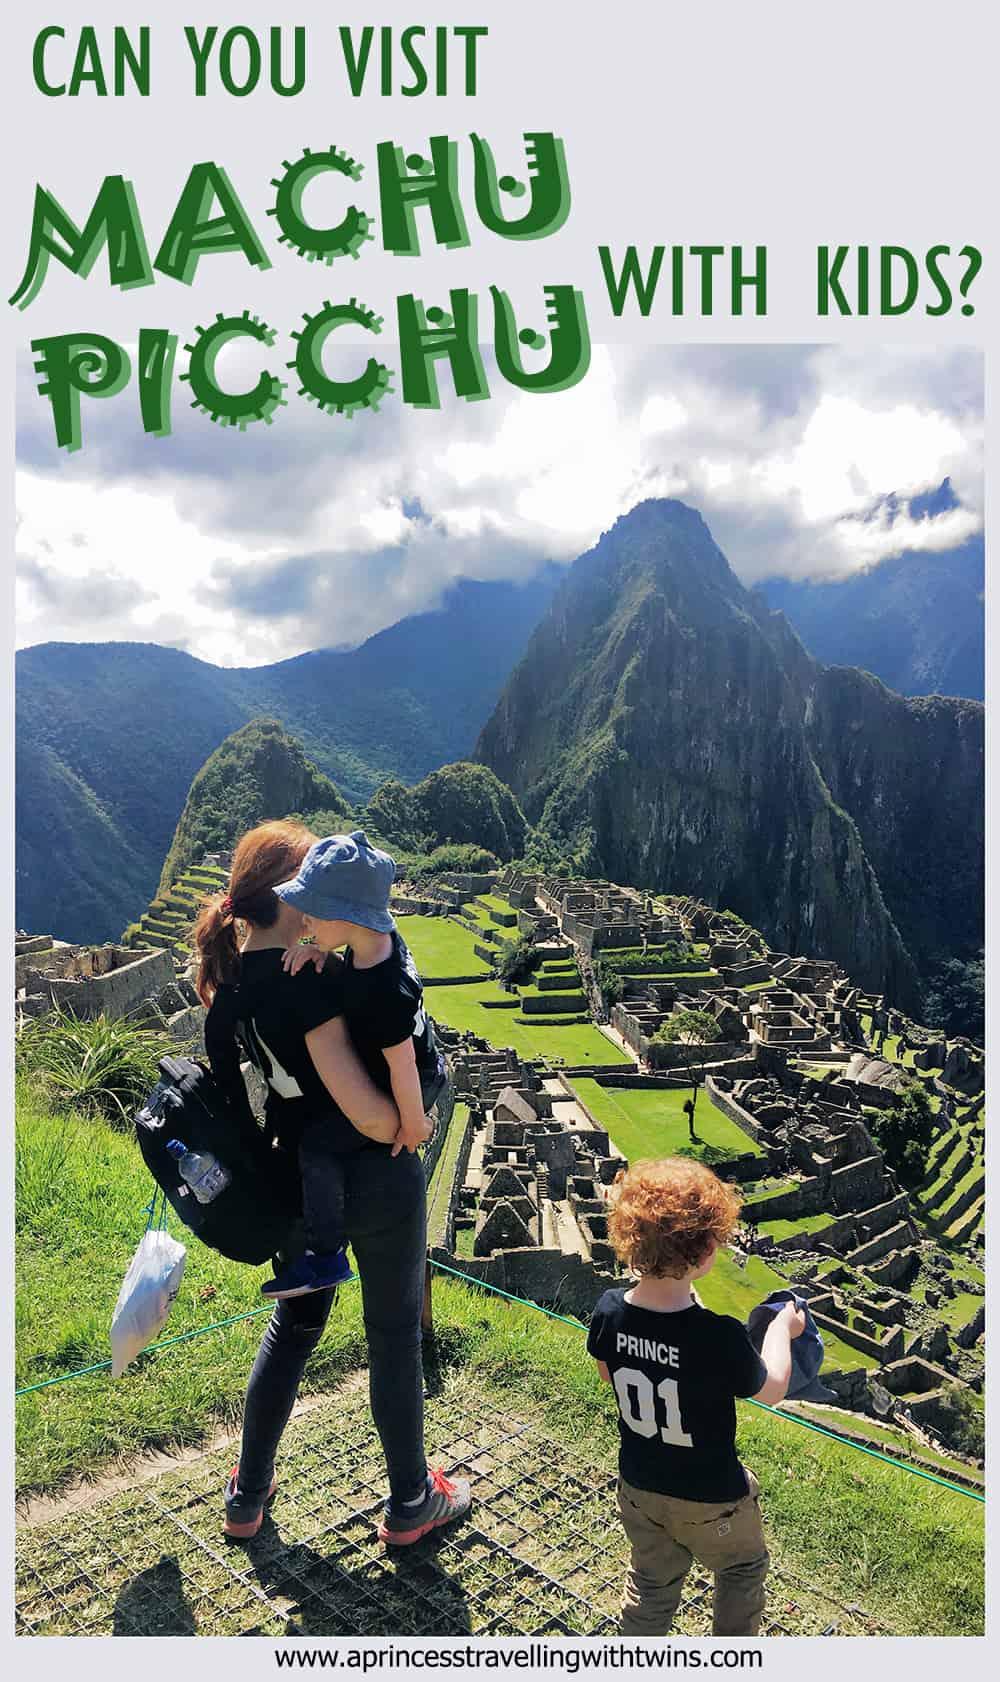 Can you visit Machu Picchu with kids?